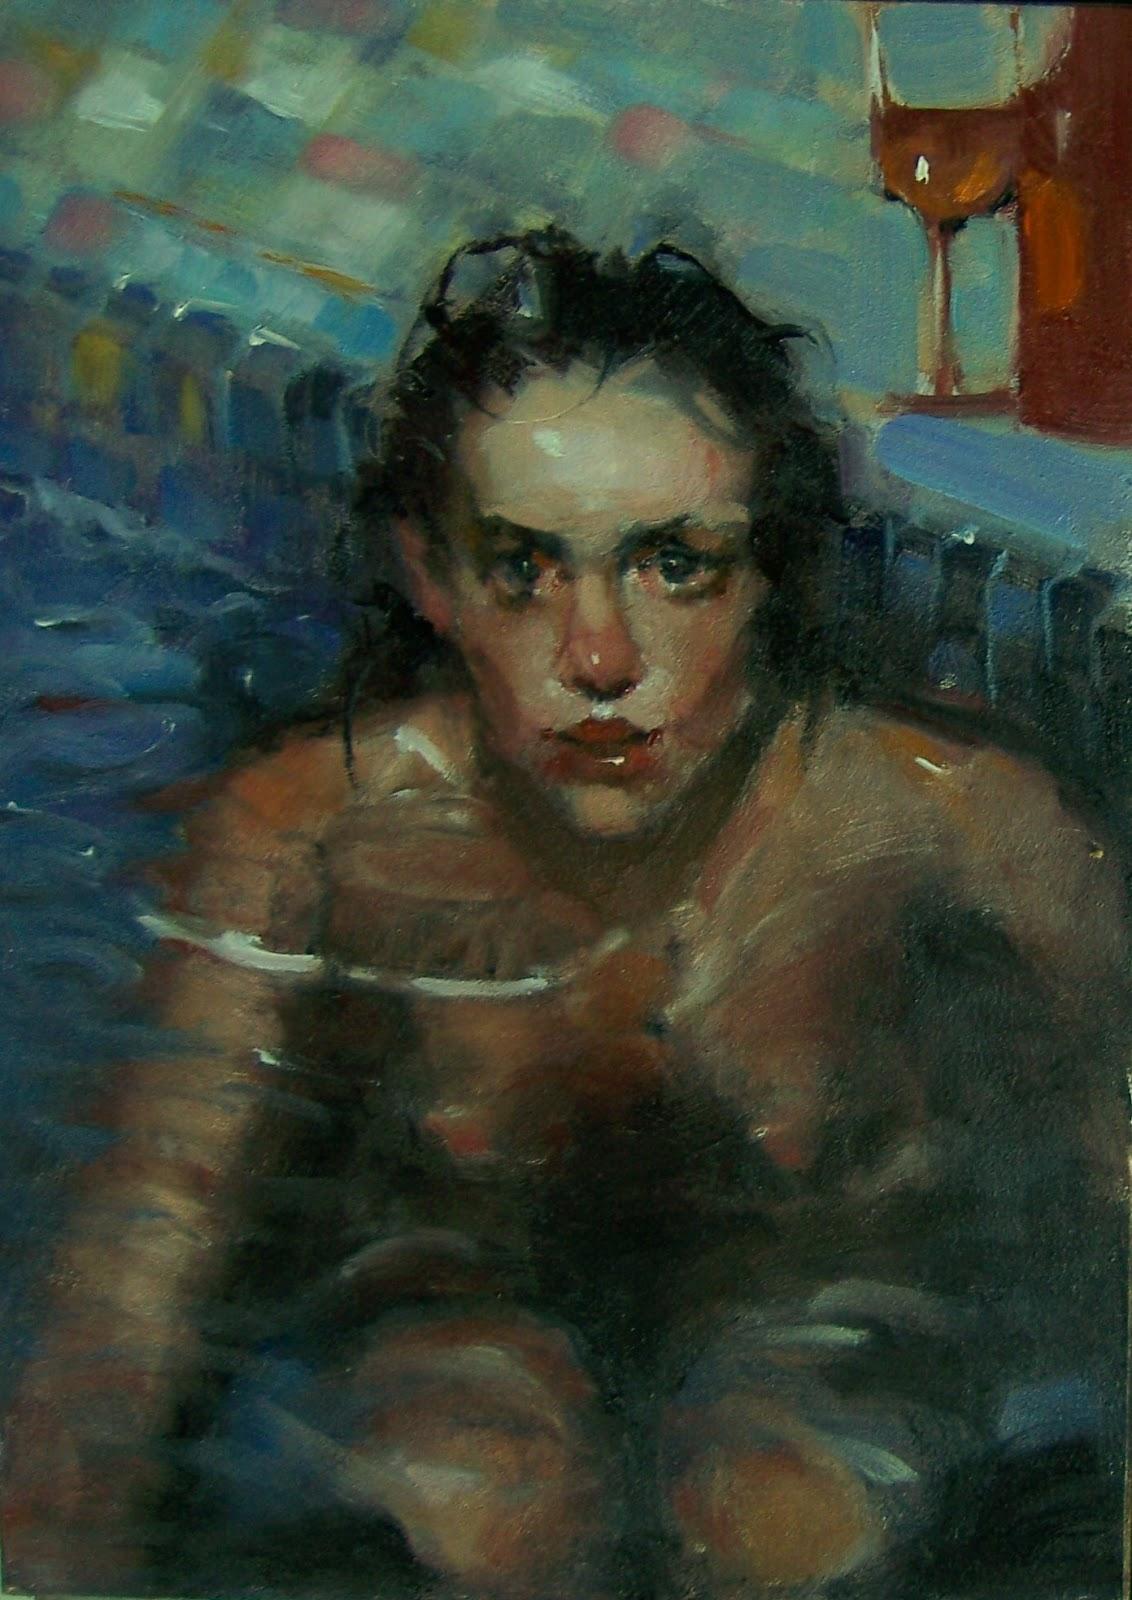 Reply, art nude nude prima suggest you